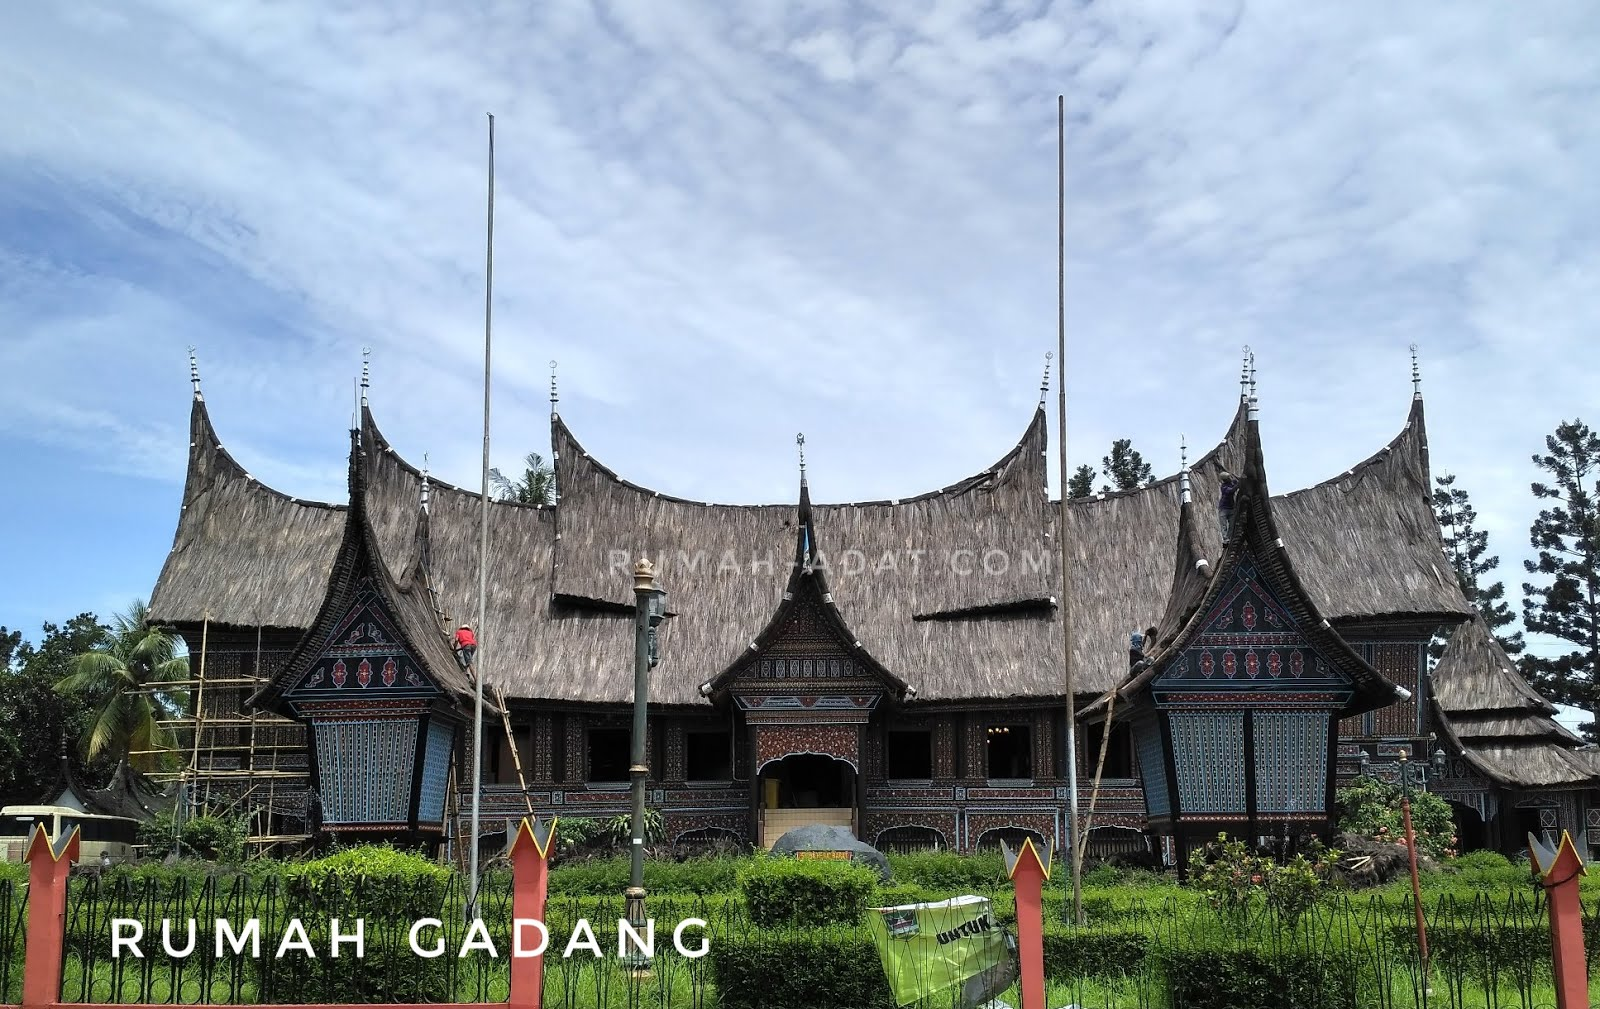 Kusus dewasa Gambar Animasi Rumah Adat Sumatera Barat